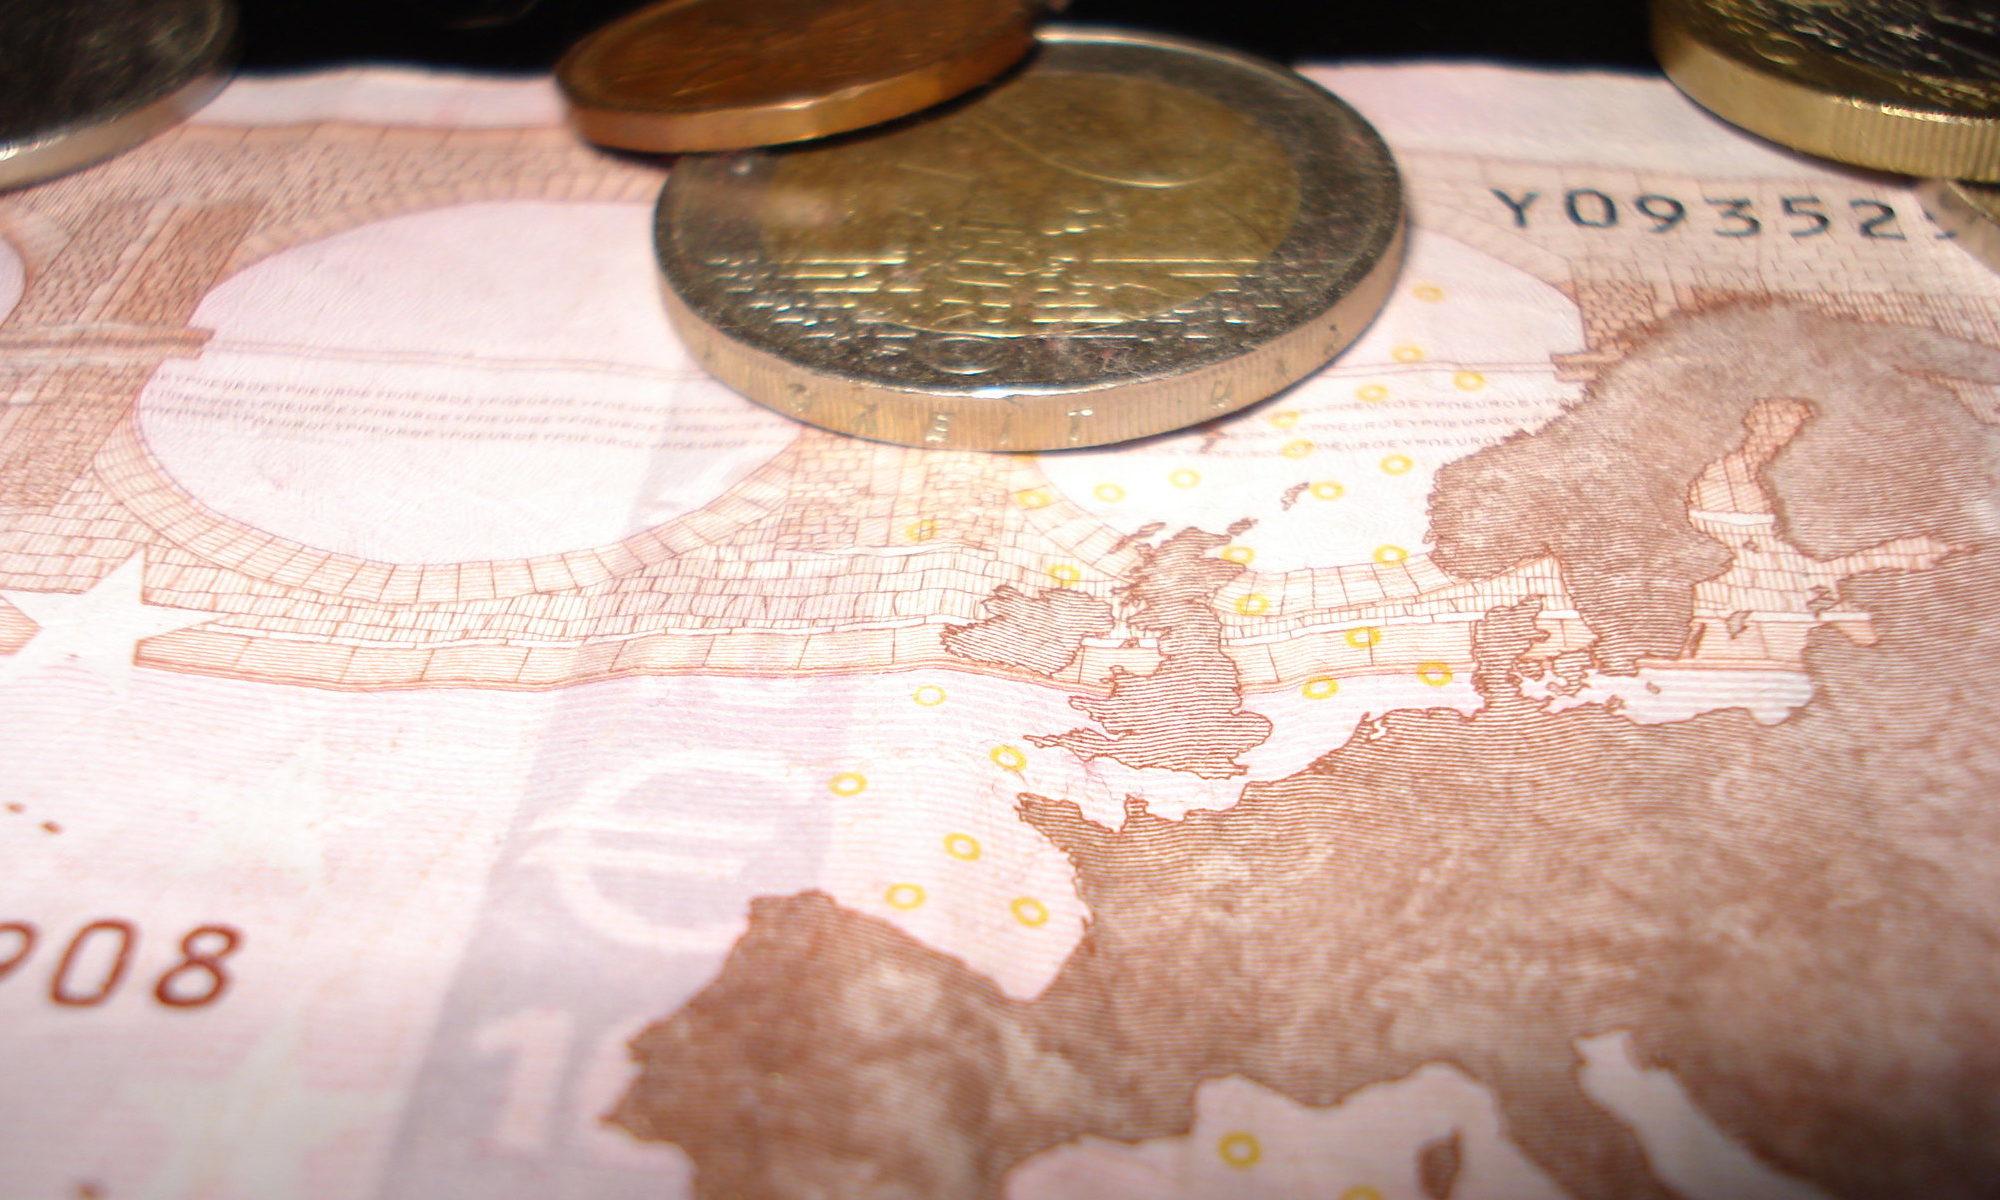 Euro 2 CC-by par wfabry https://flic.kr/p/4hFyBH